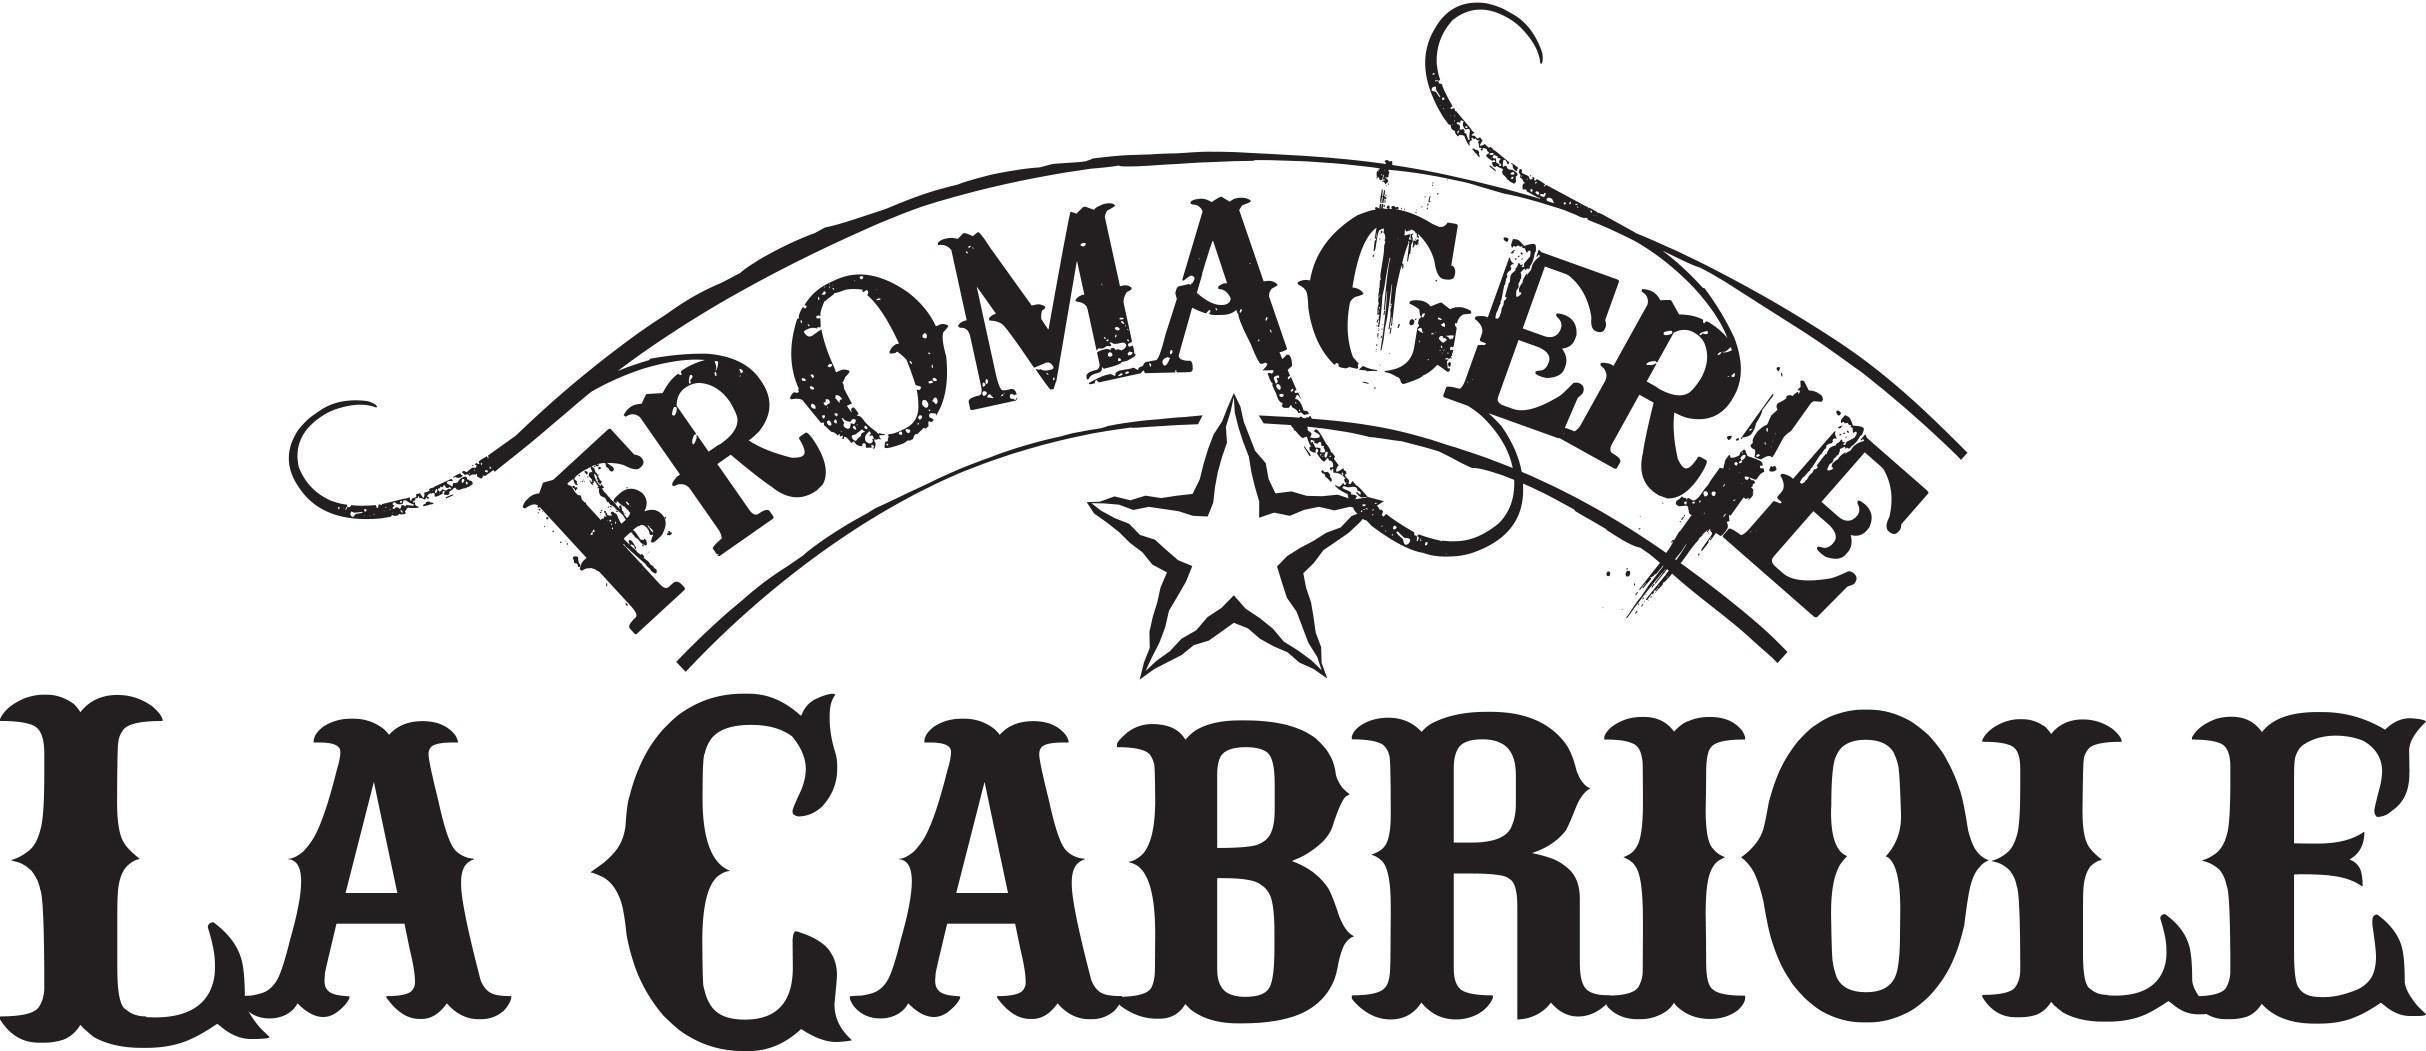 Fromagerie La Cabriole